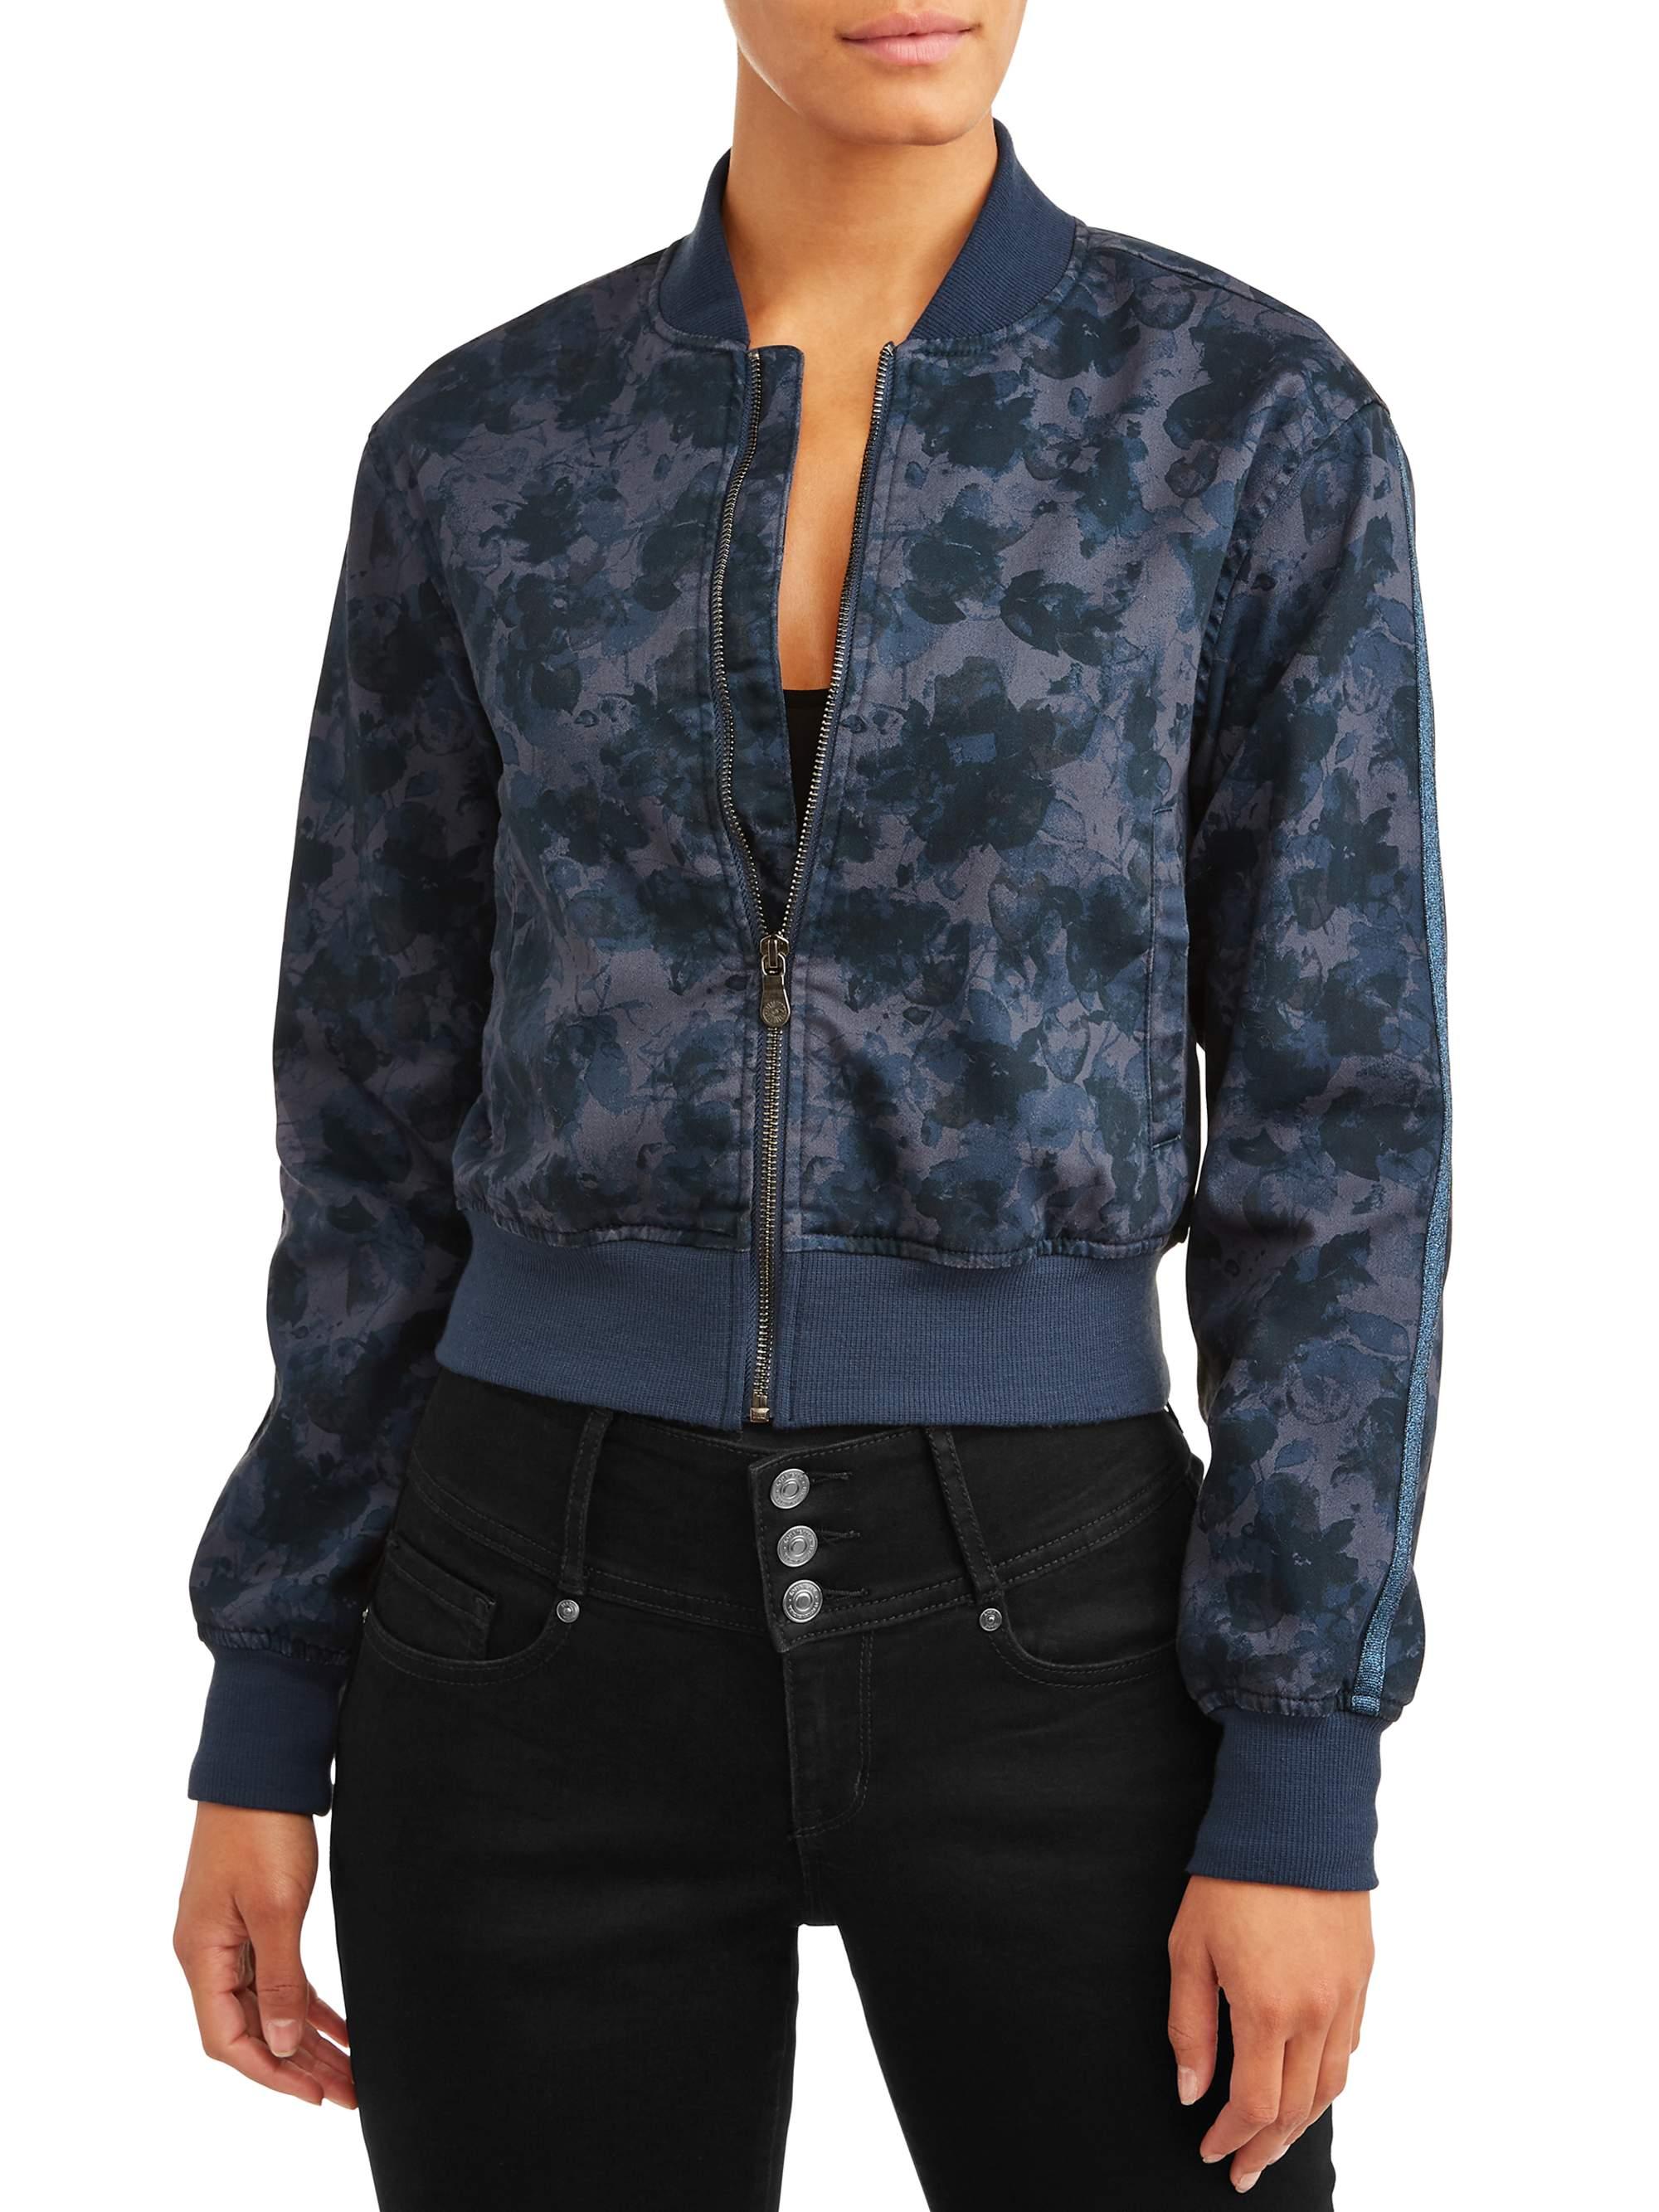 Sofia Vanesa Knit Bomber Jacket Women's (Floral Camo)